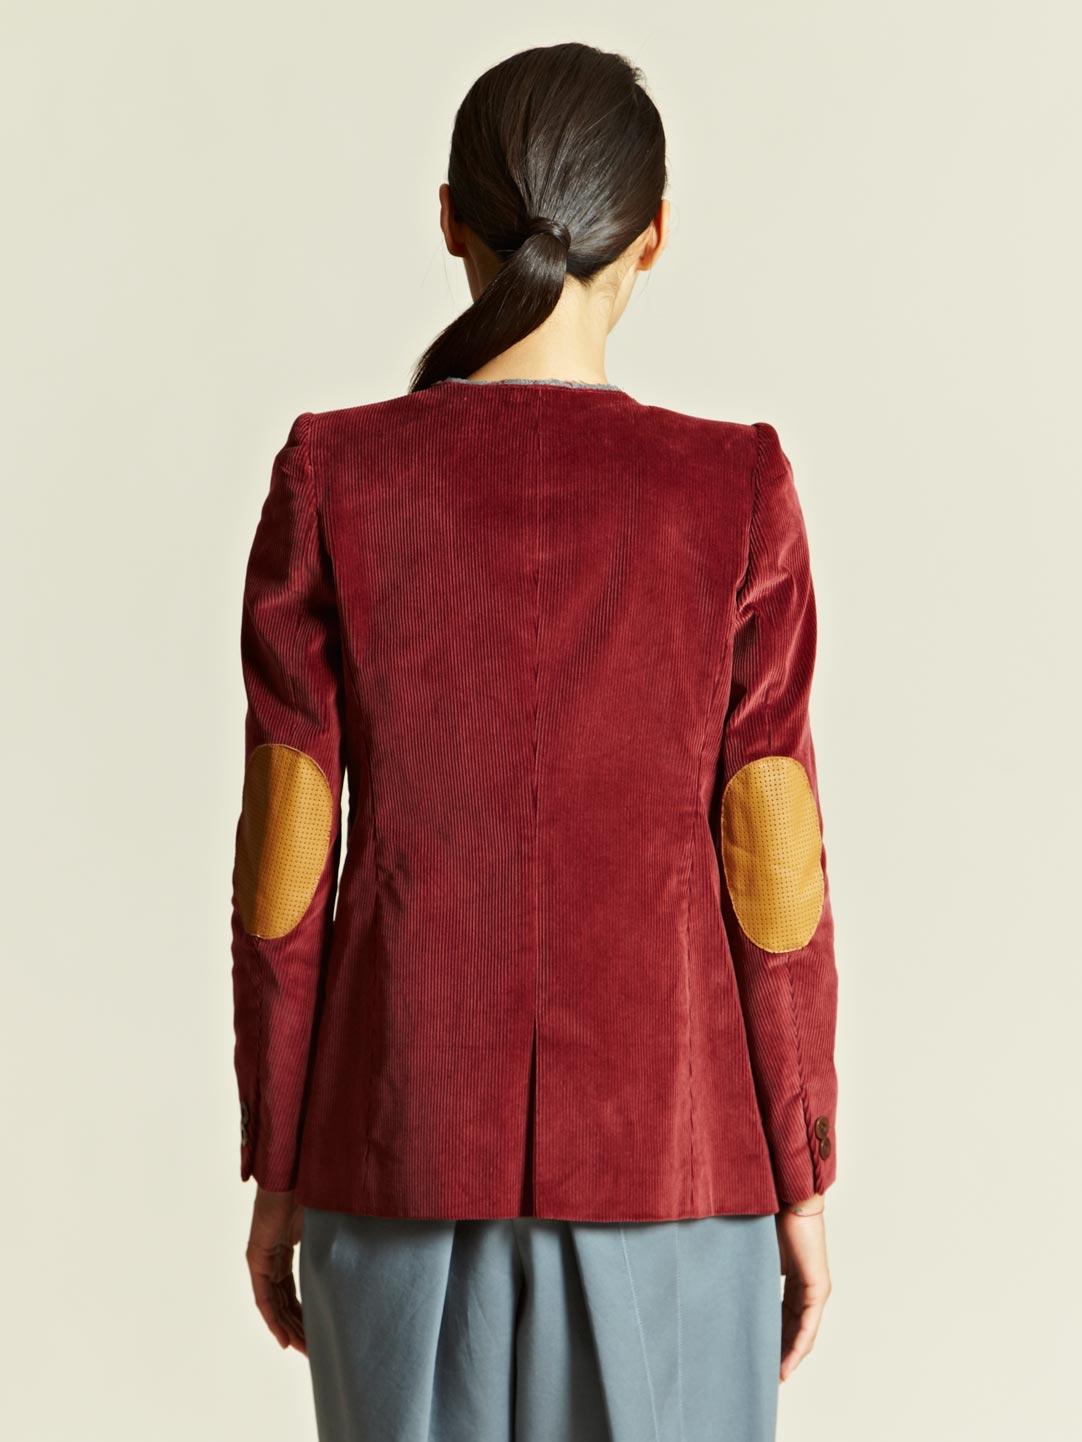 Kolor Kolor Womens Corduroy Jacket In Burgundy Purple Lyst